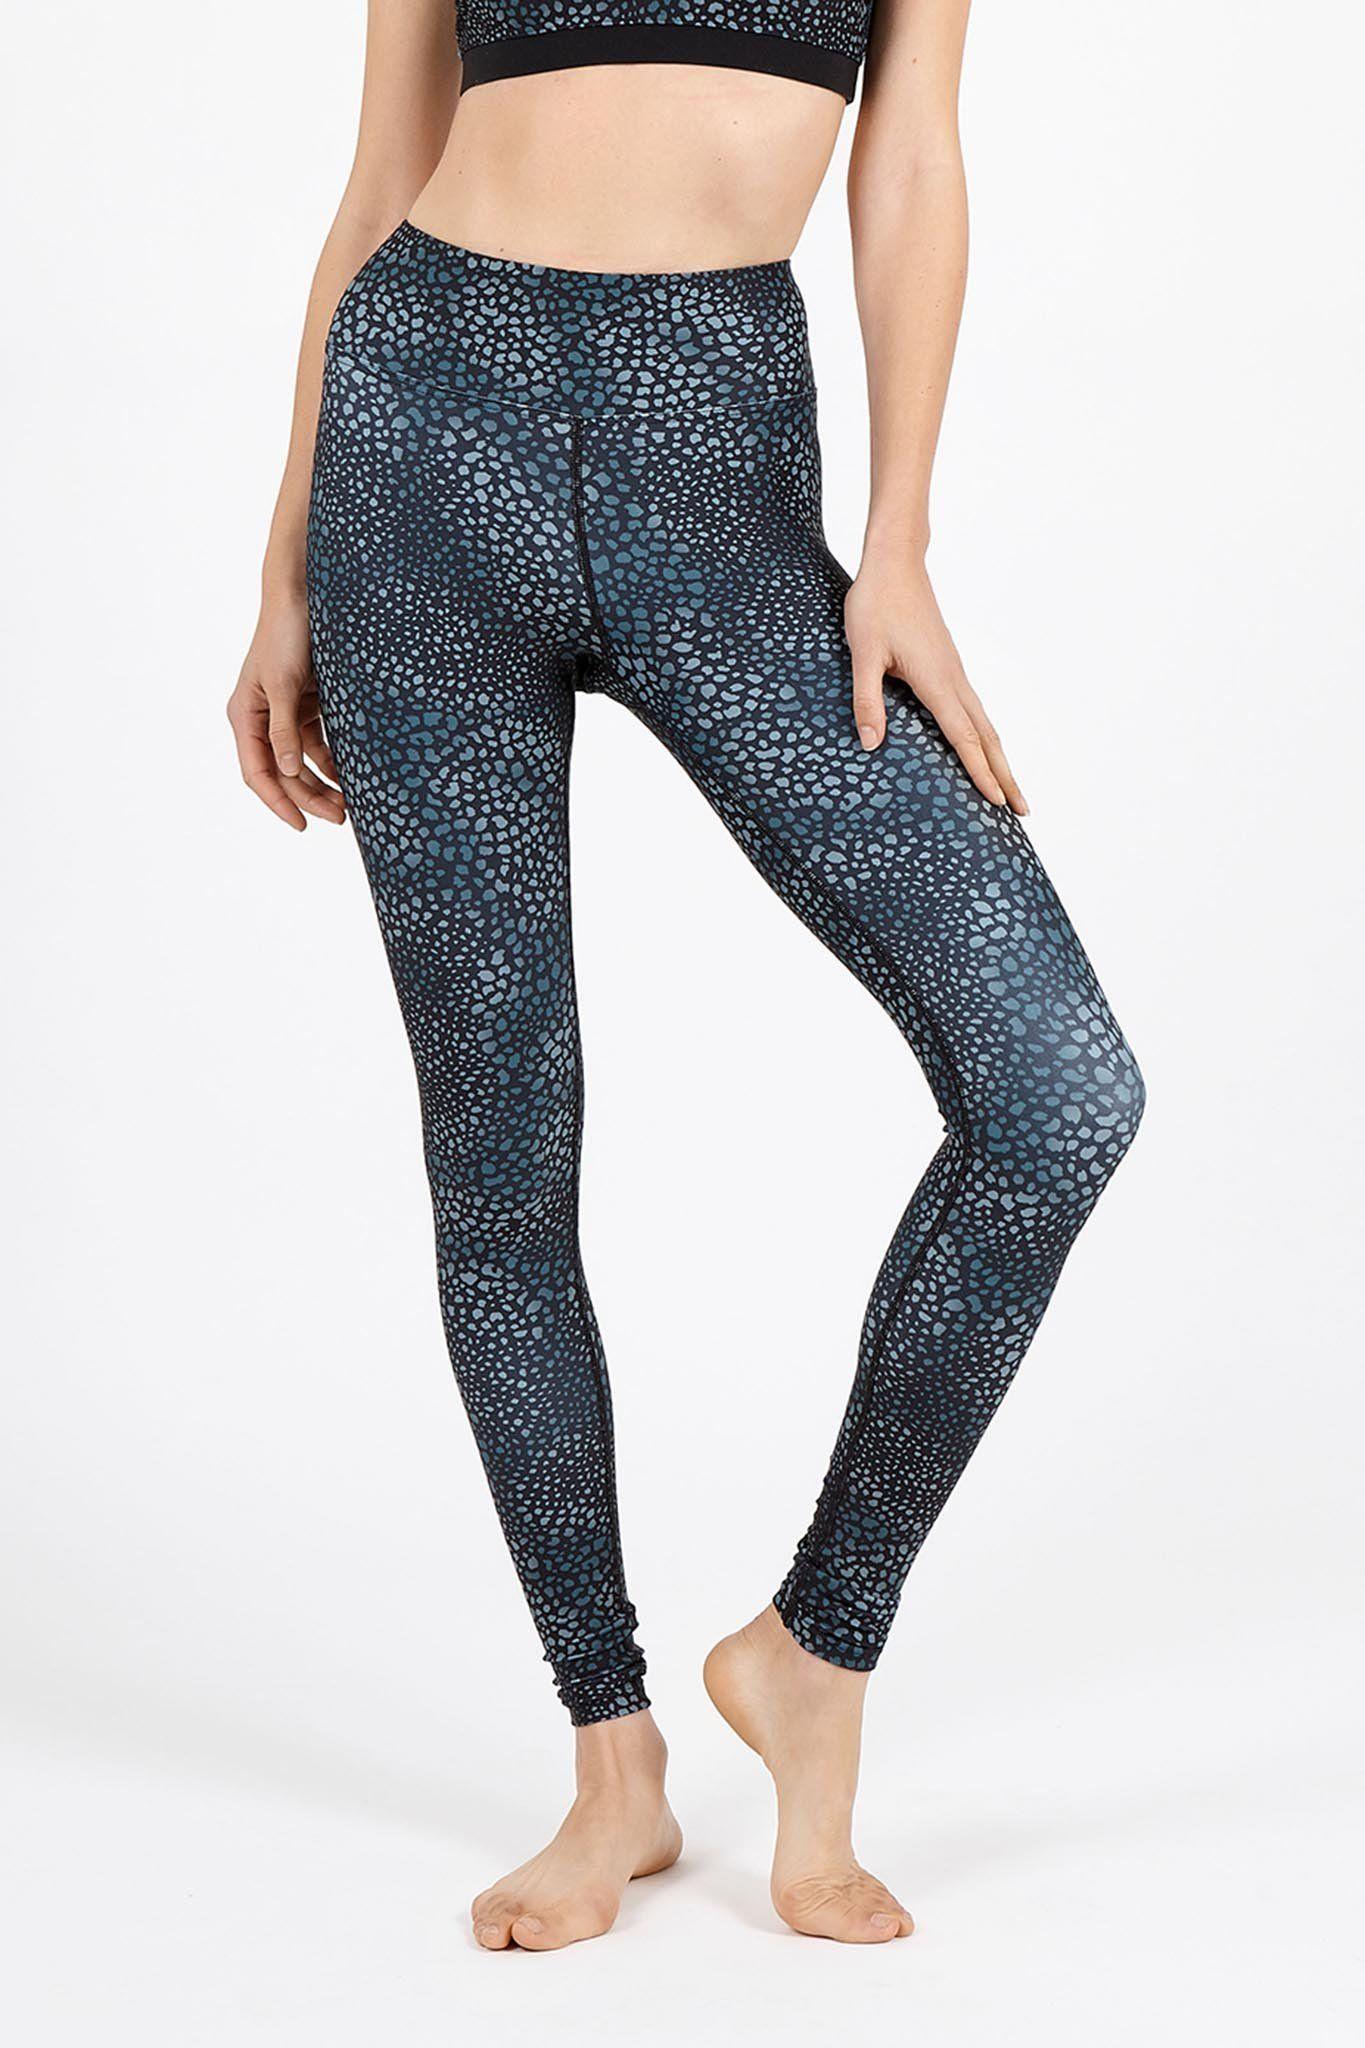 fe3cc5ec27ca3e Animal Love High Waist Printed Yoga Legging - Full Length | Women's Yoga  and Activewear Clothing